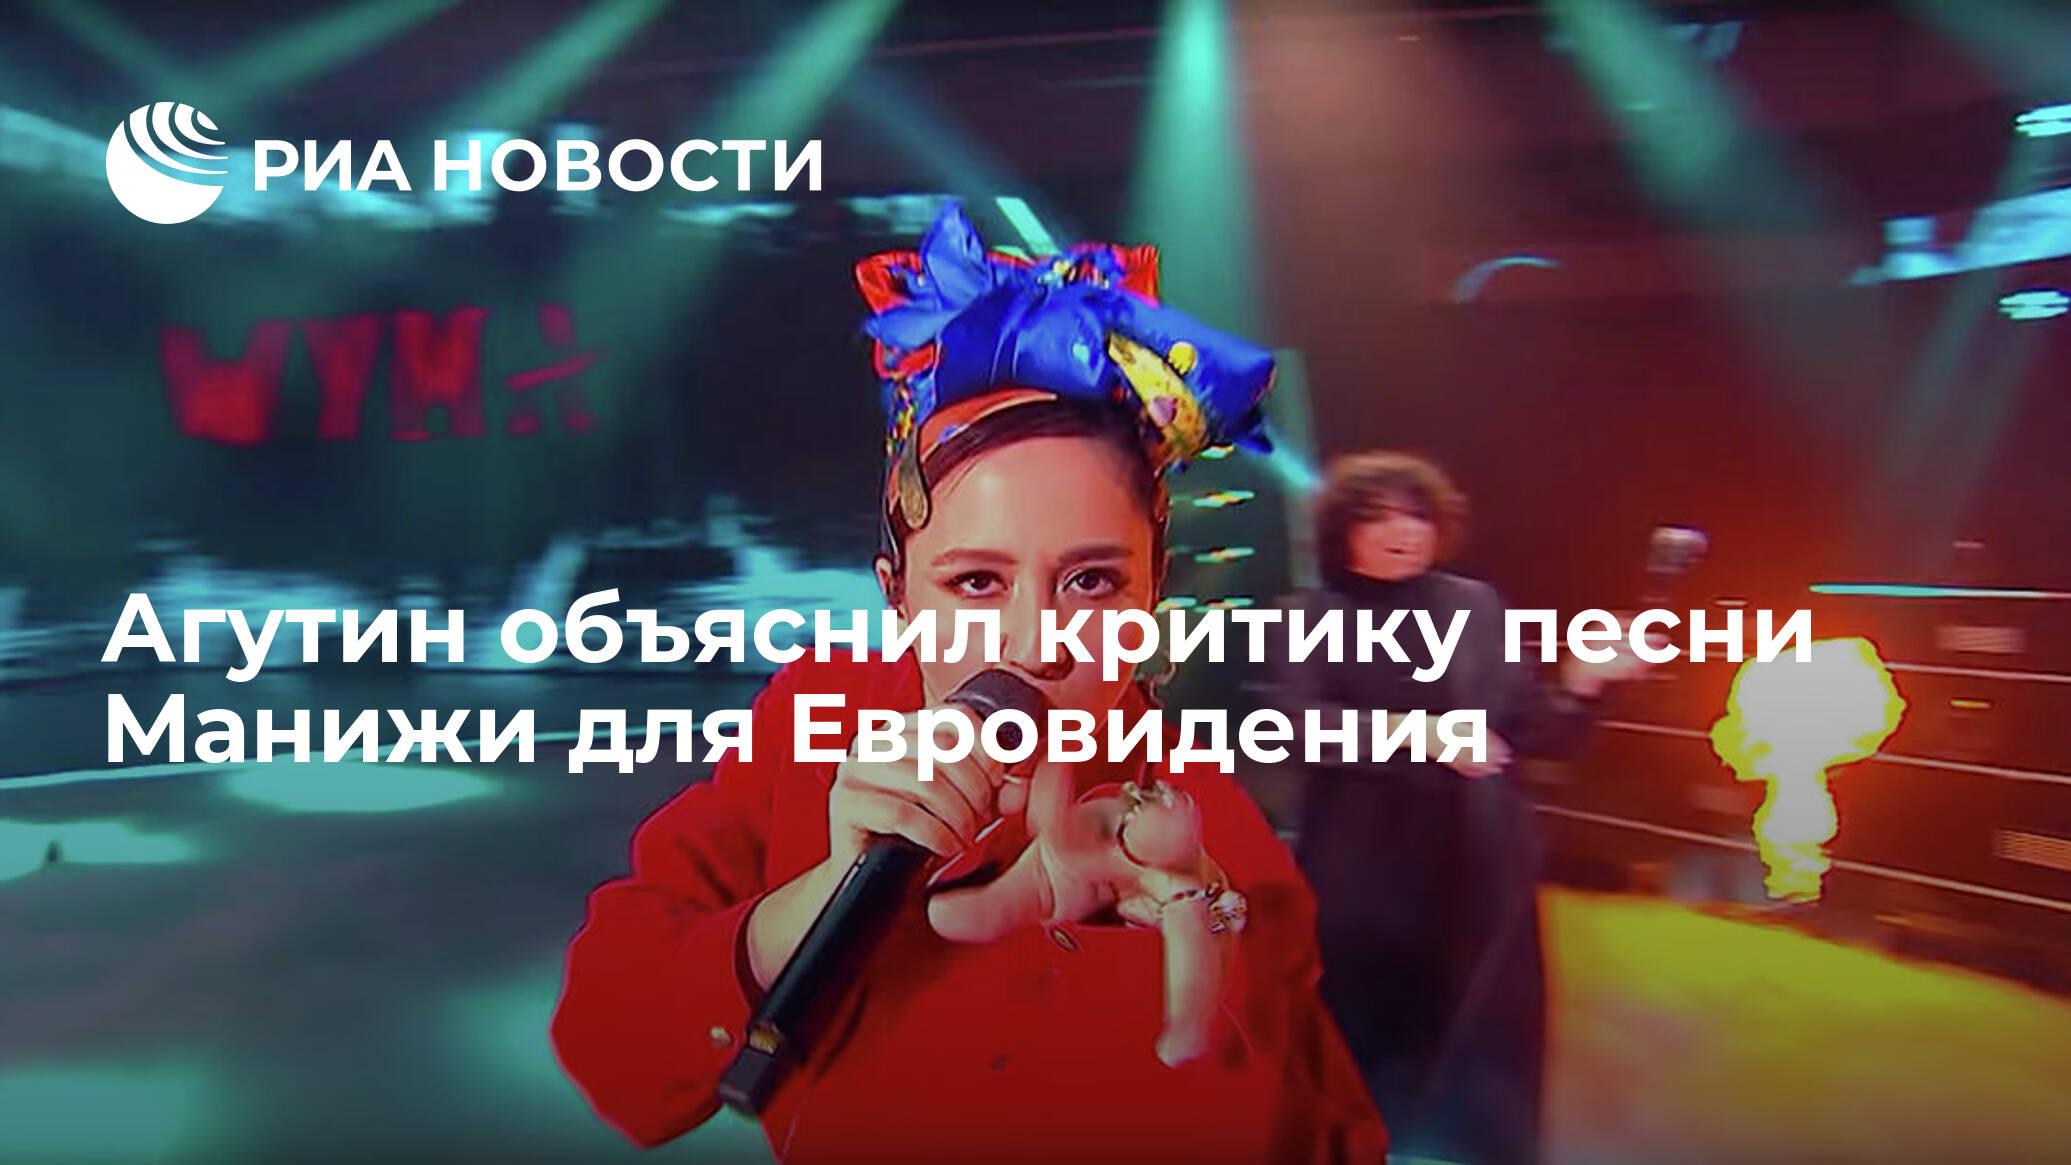 Агутин объяснил критику песни Манижи для Евровидения